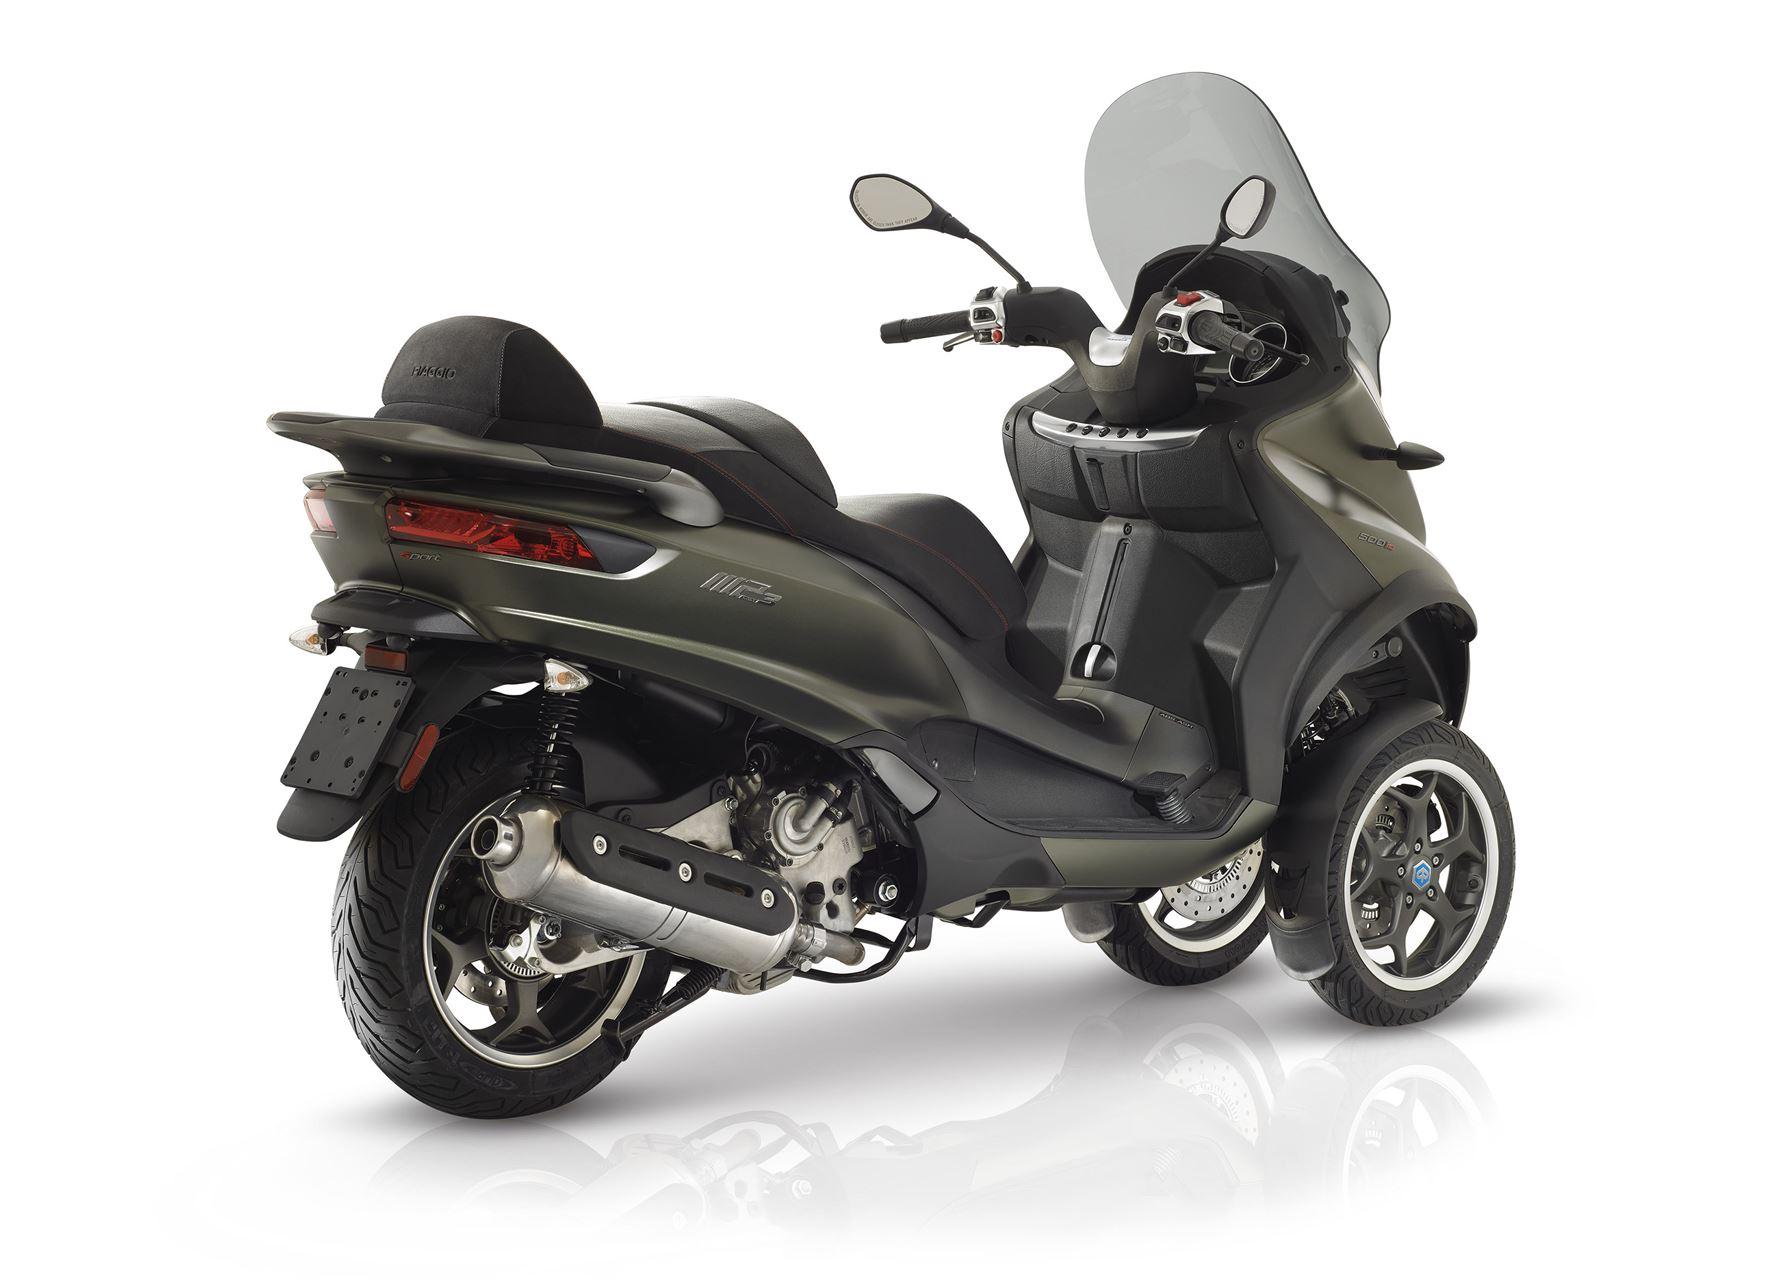 piaggio mp3 500 lt sport scooter acima 125 cc cais motor. Black Bedroom Furniture Sets. Home Design Ideas